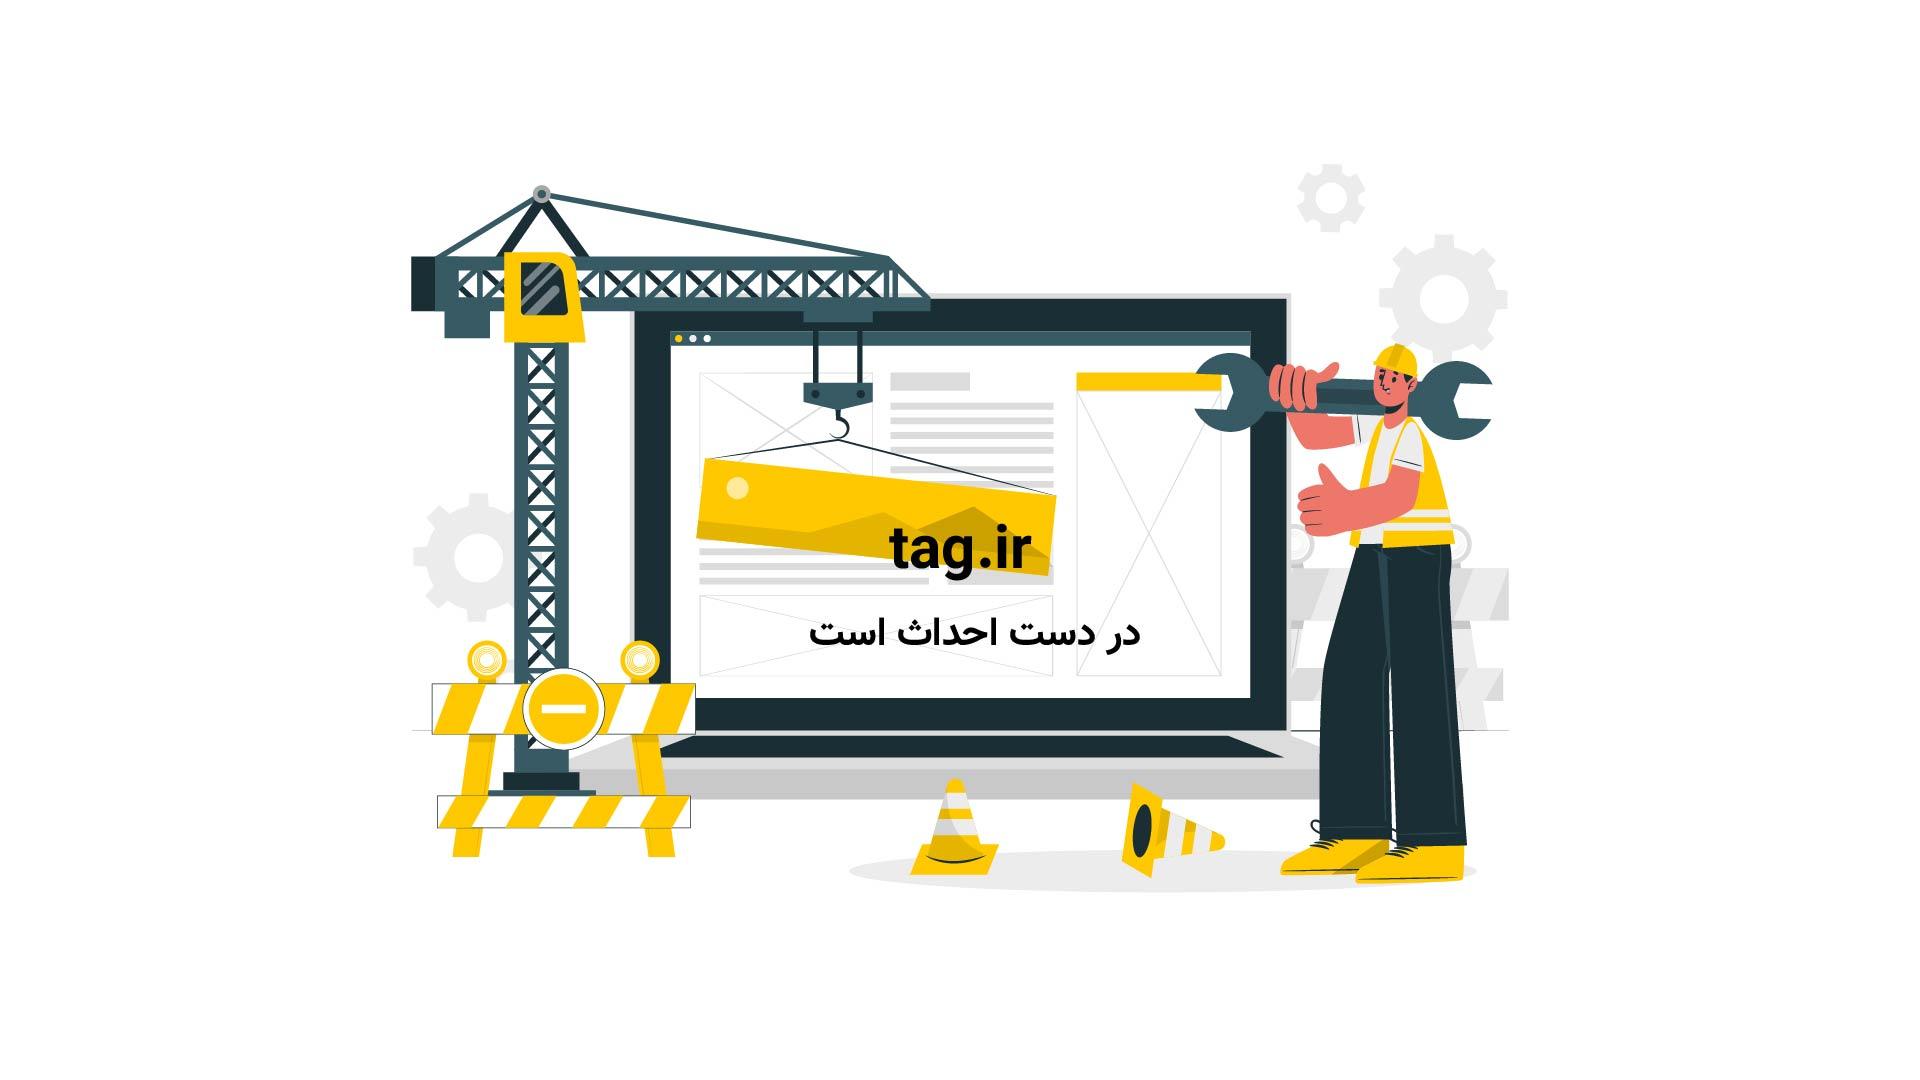 اسپاگتی مرغ لیمویی | تگ